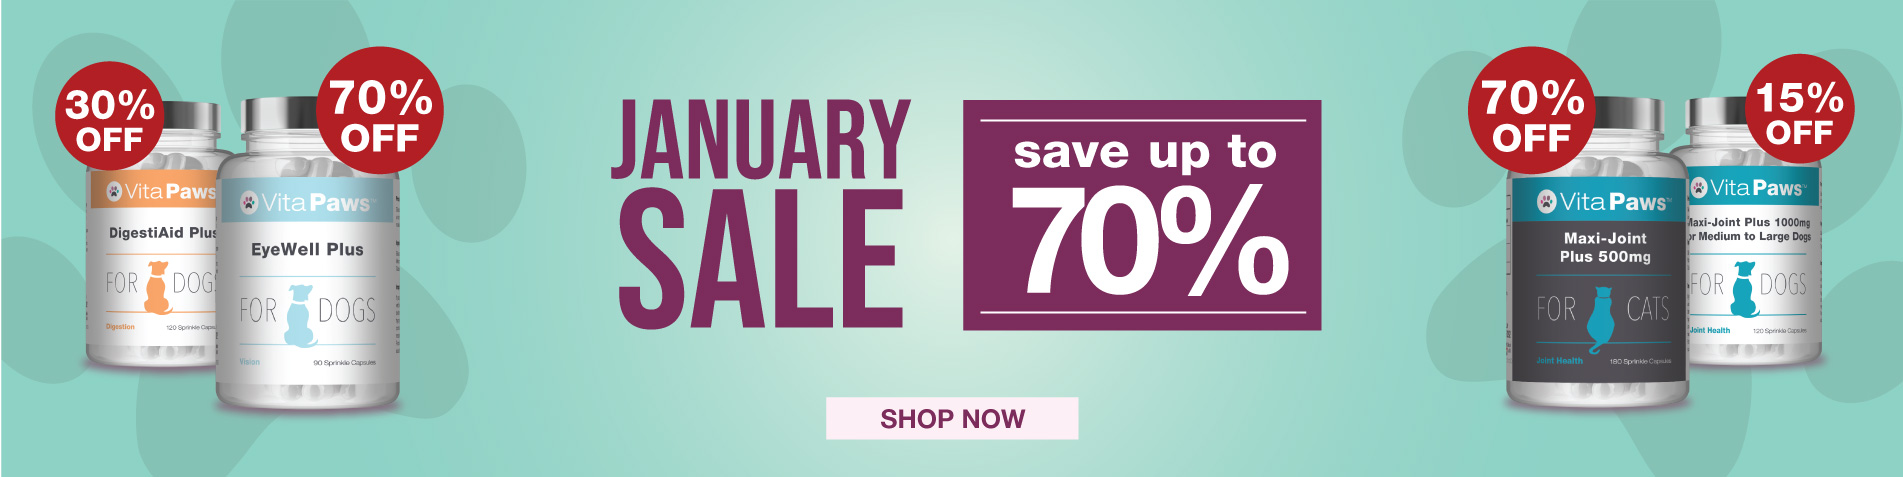 VitaPaws January Sale